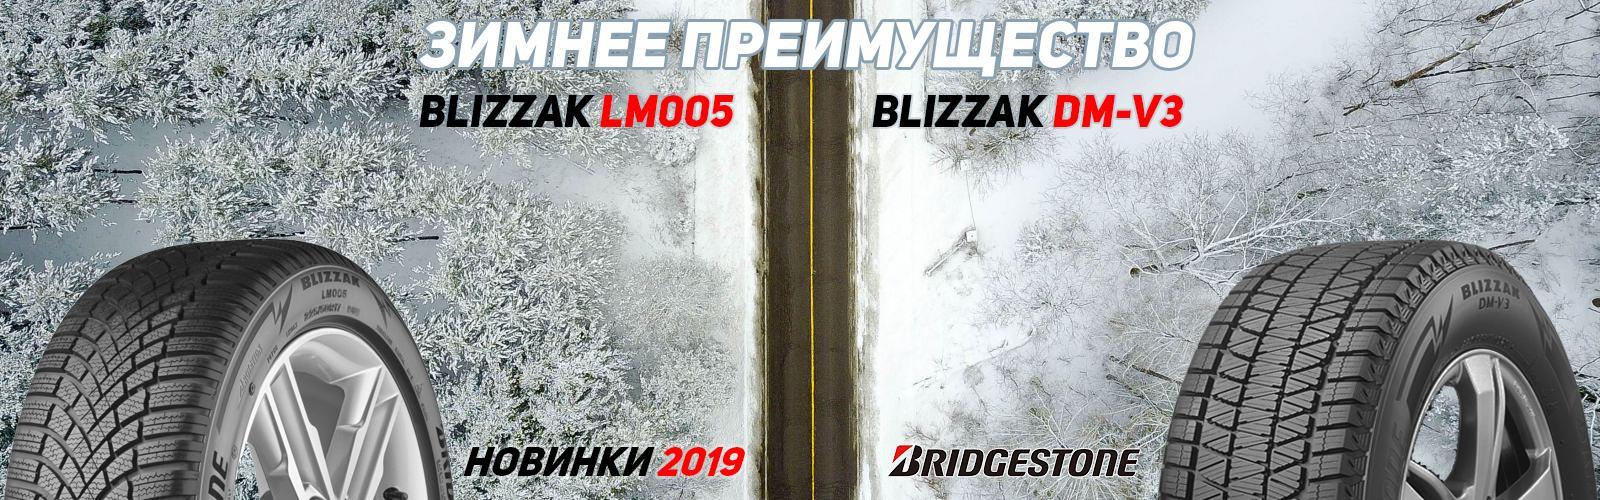 Bridgestone Blizzak LM005 и Bridgestone Blizzak DM-V3 – зимнее преимущество